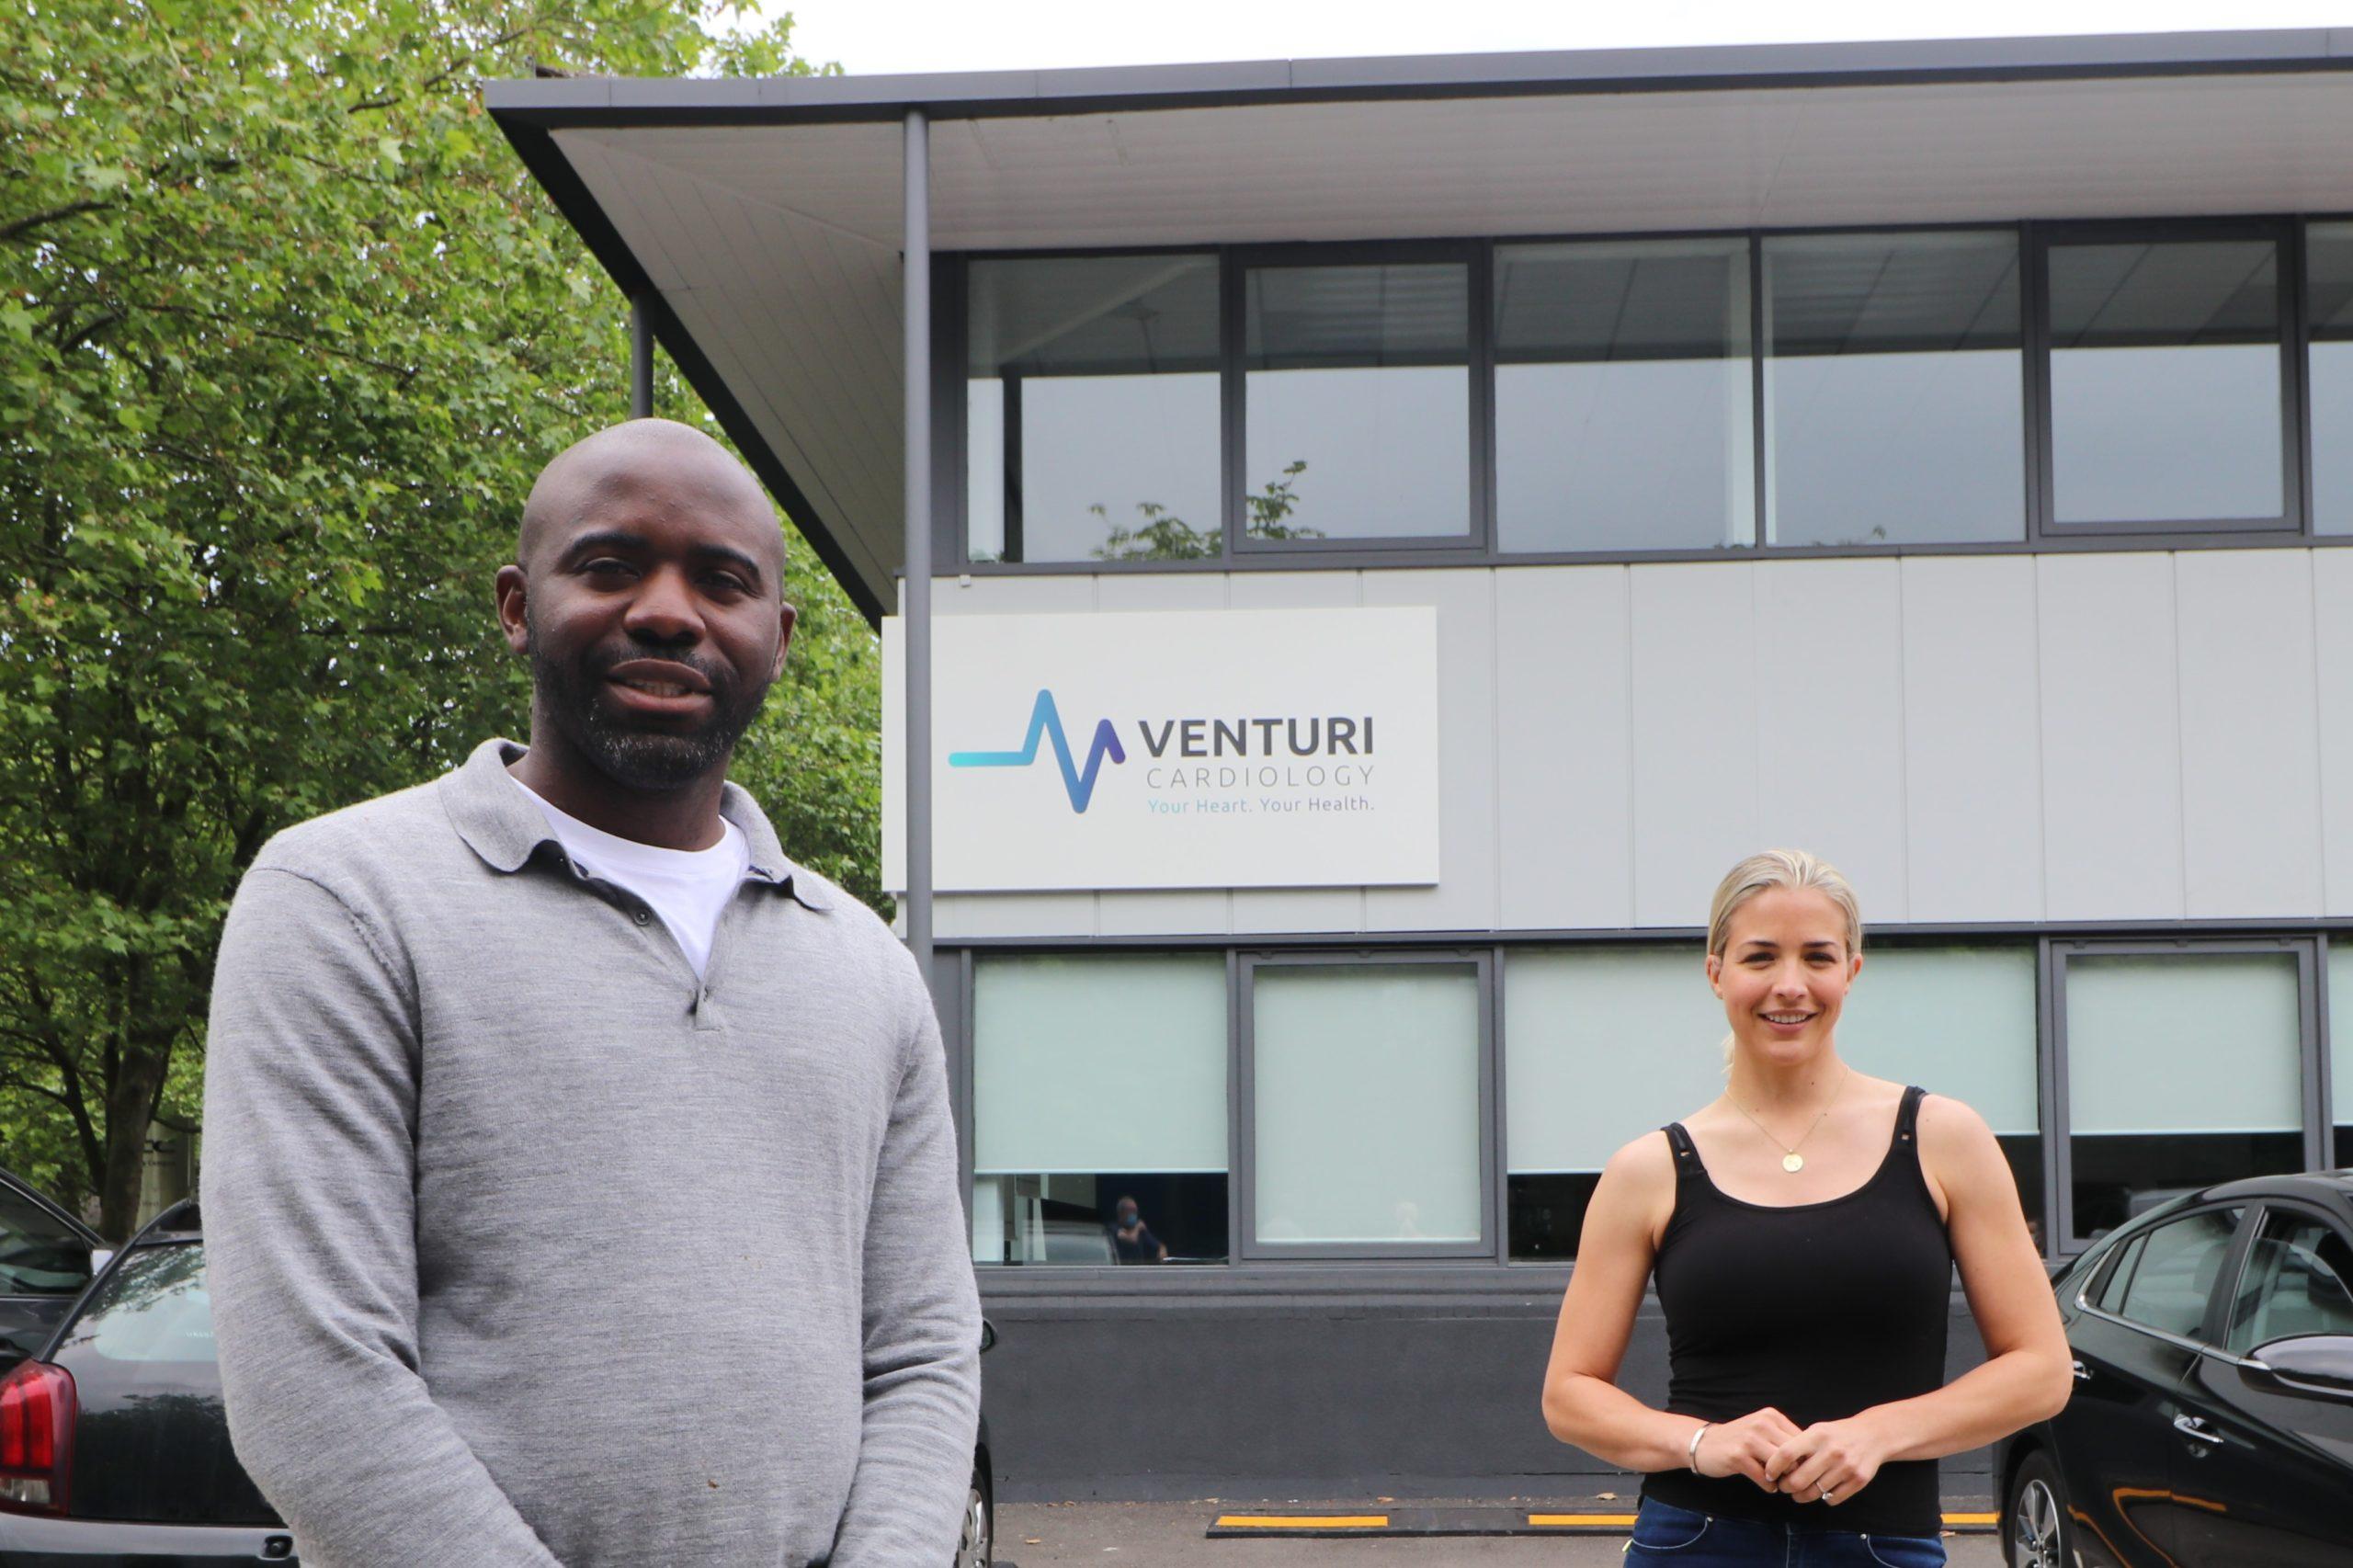 Fabrice Muamba, Gemma Atkinson and Lizzie Jones MBE officially open Venturi Cardiology